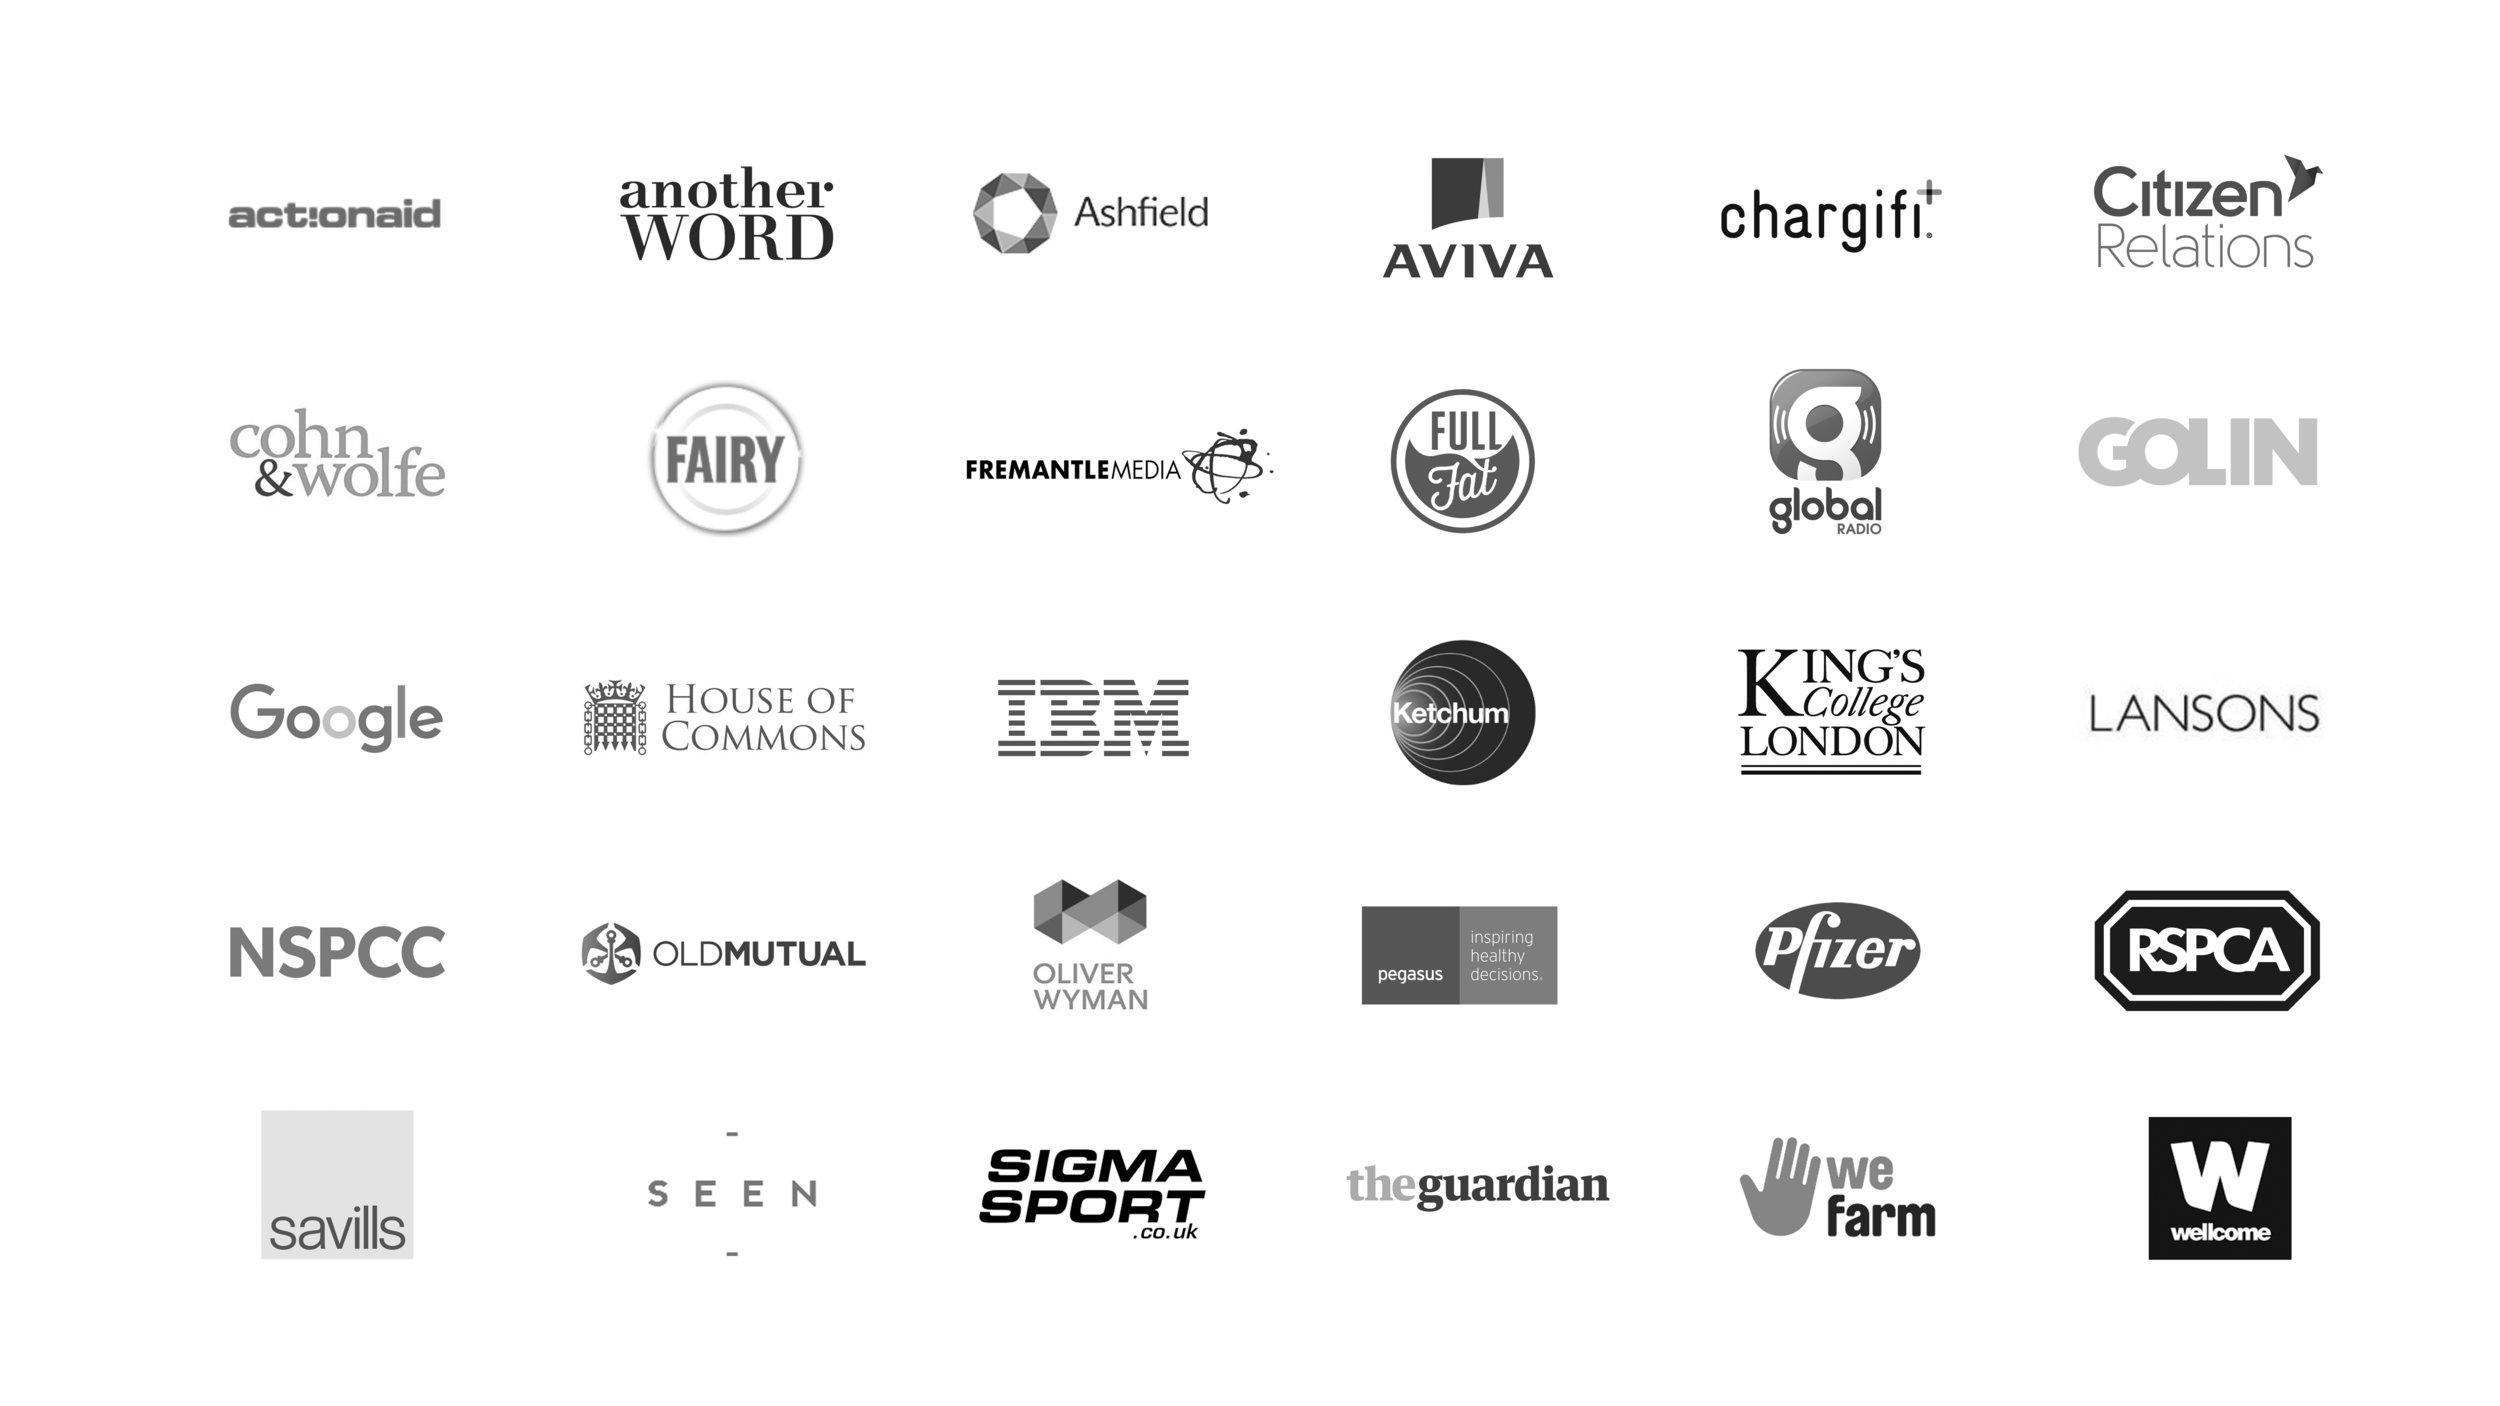 MYWW+website+logo+wall+V2.jpg